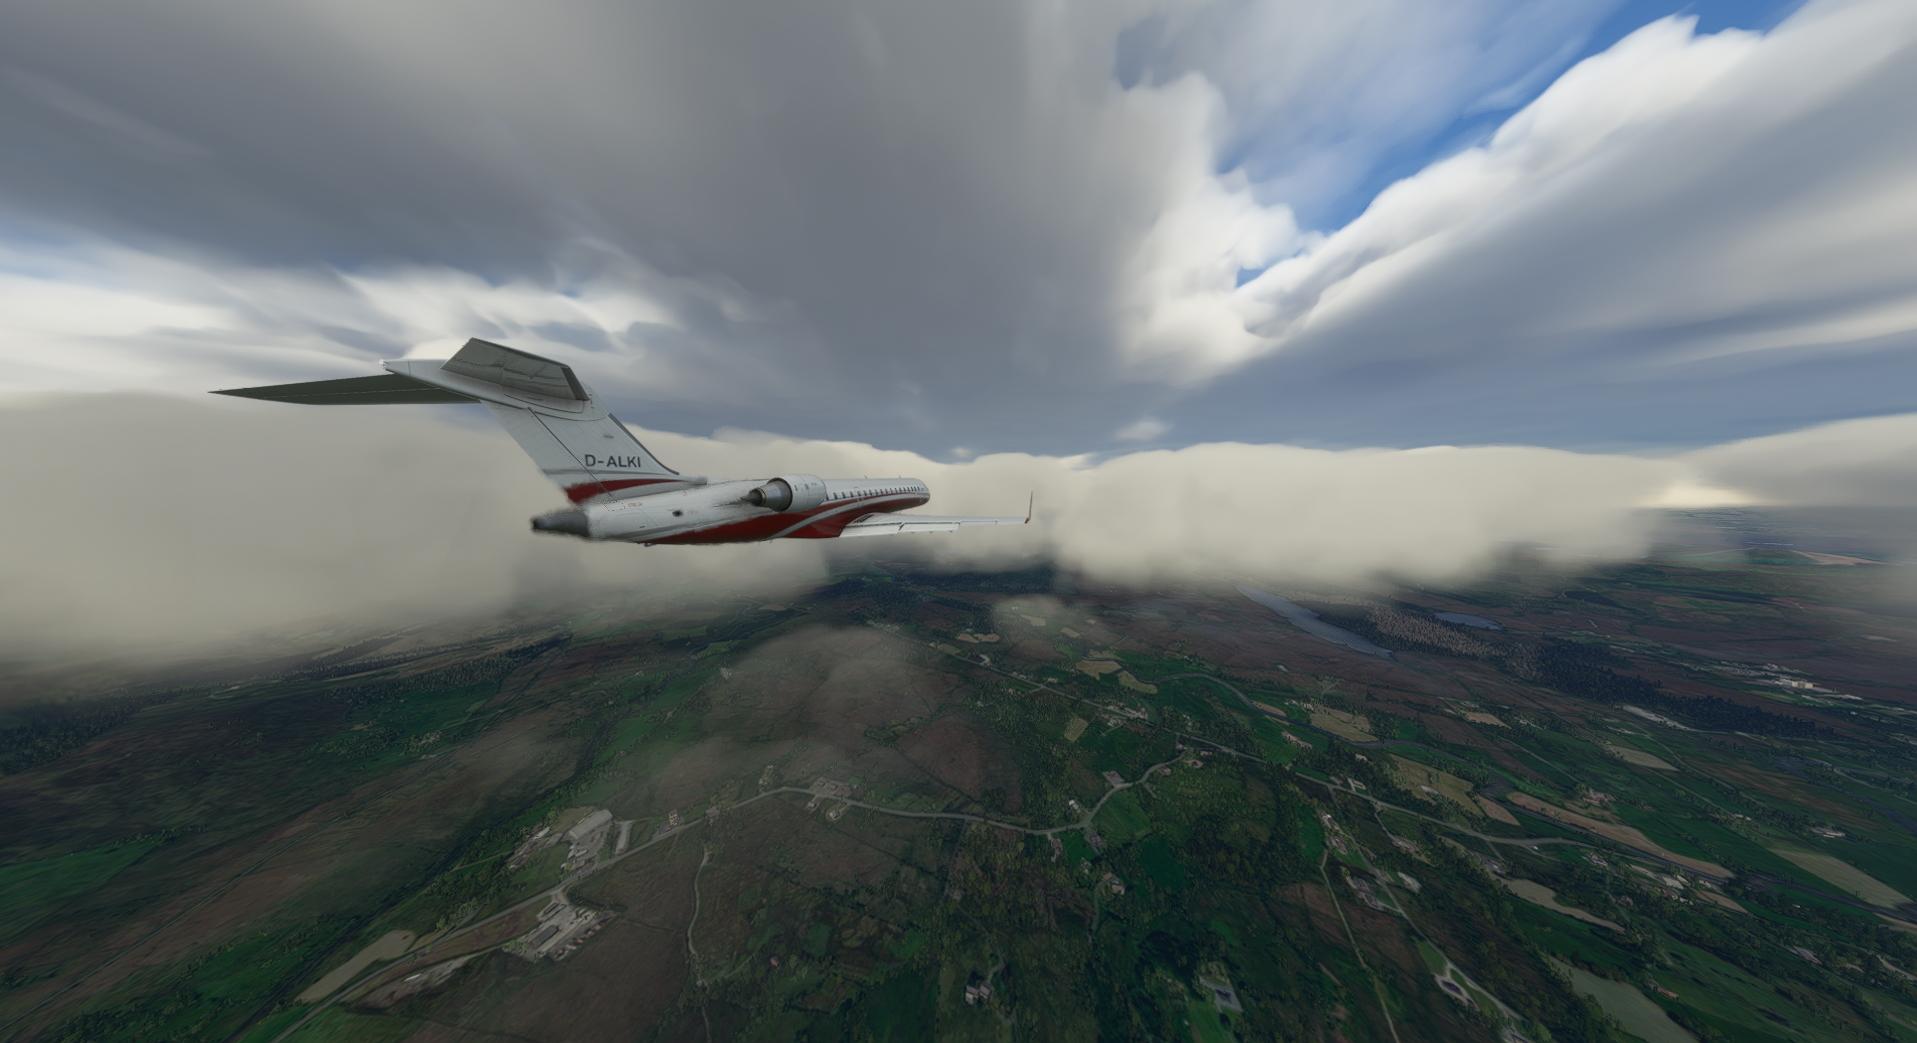 Microsoft Flight Simulator Aerosoft Crj 550 700 Stormy Approach